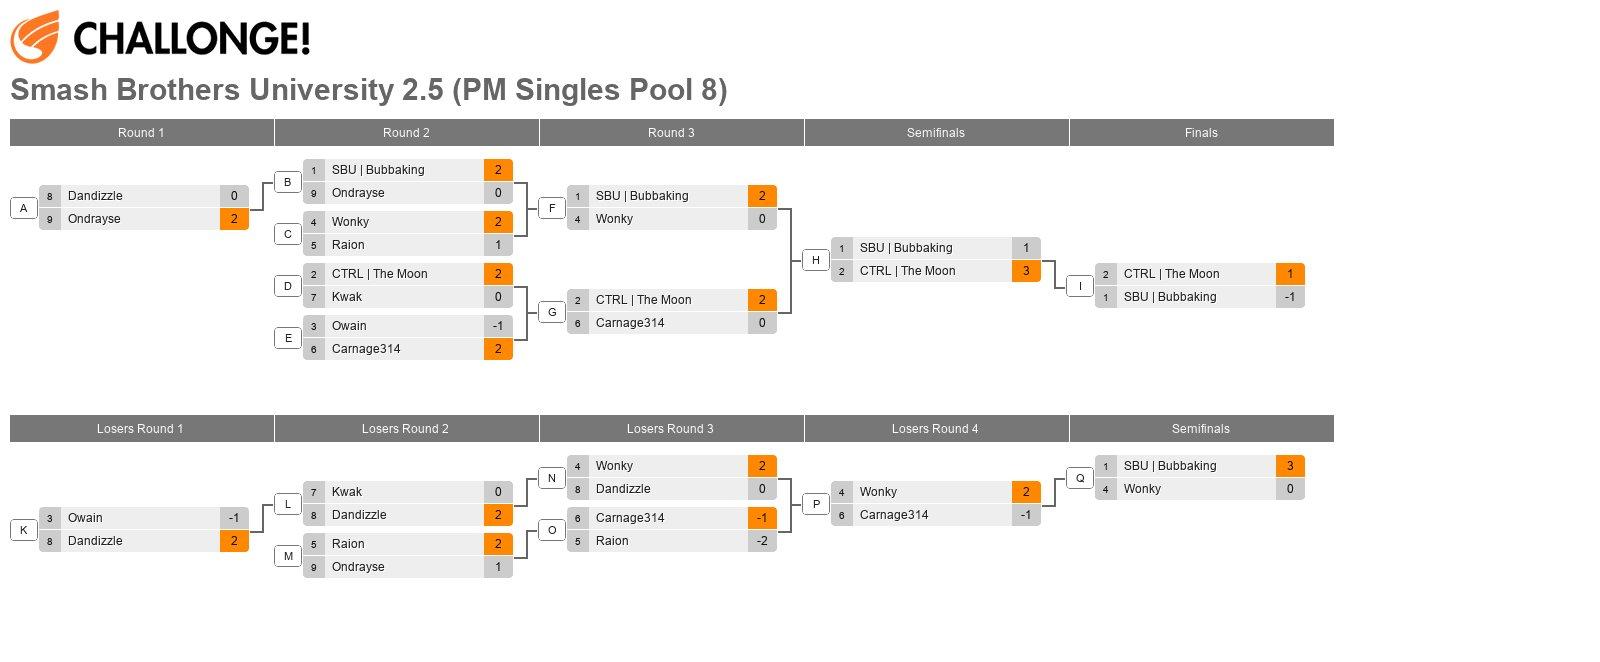 Smash Brothers University 2.5 (PM Singles Pool 8)